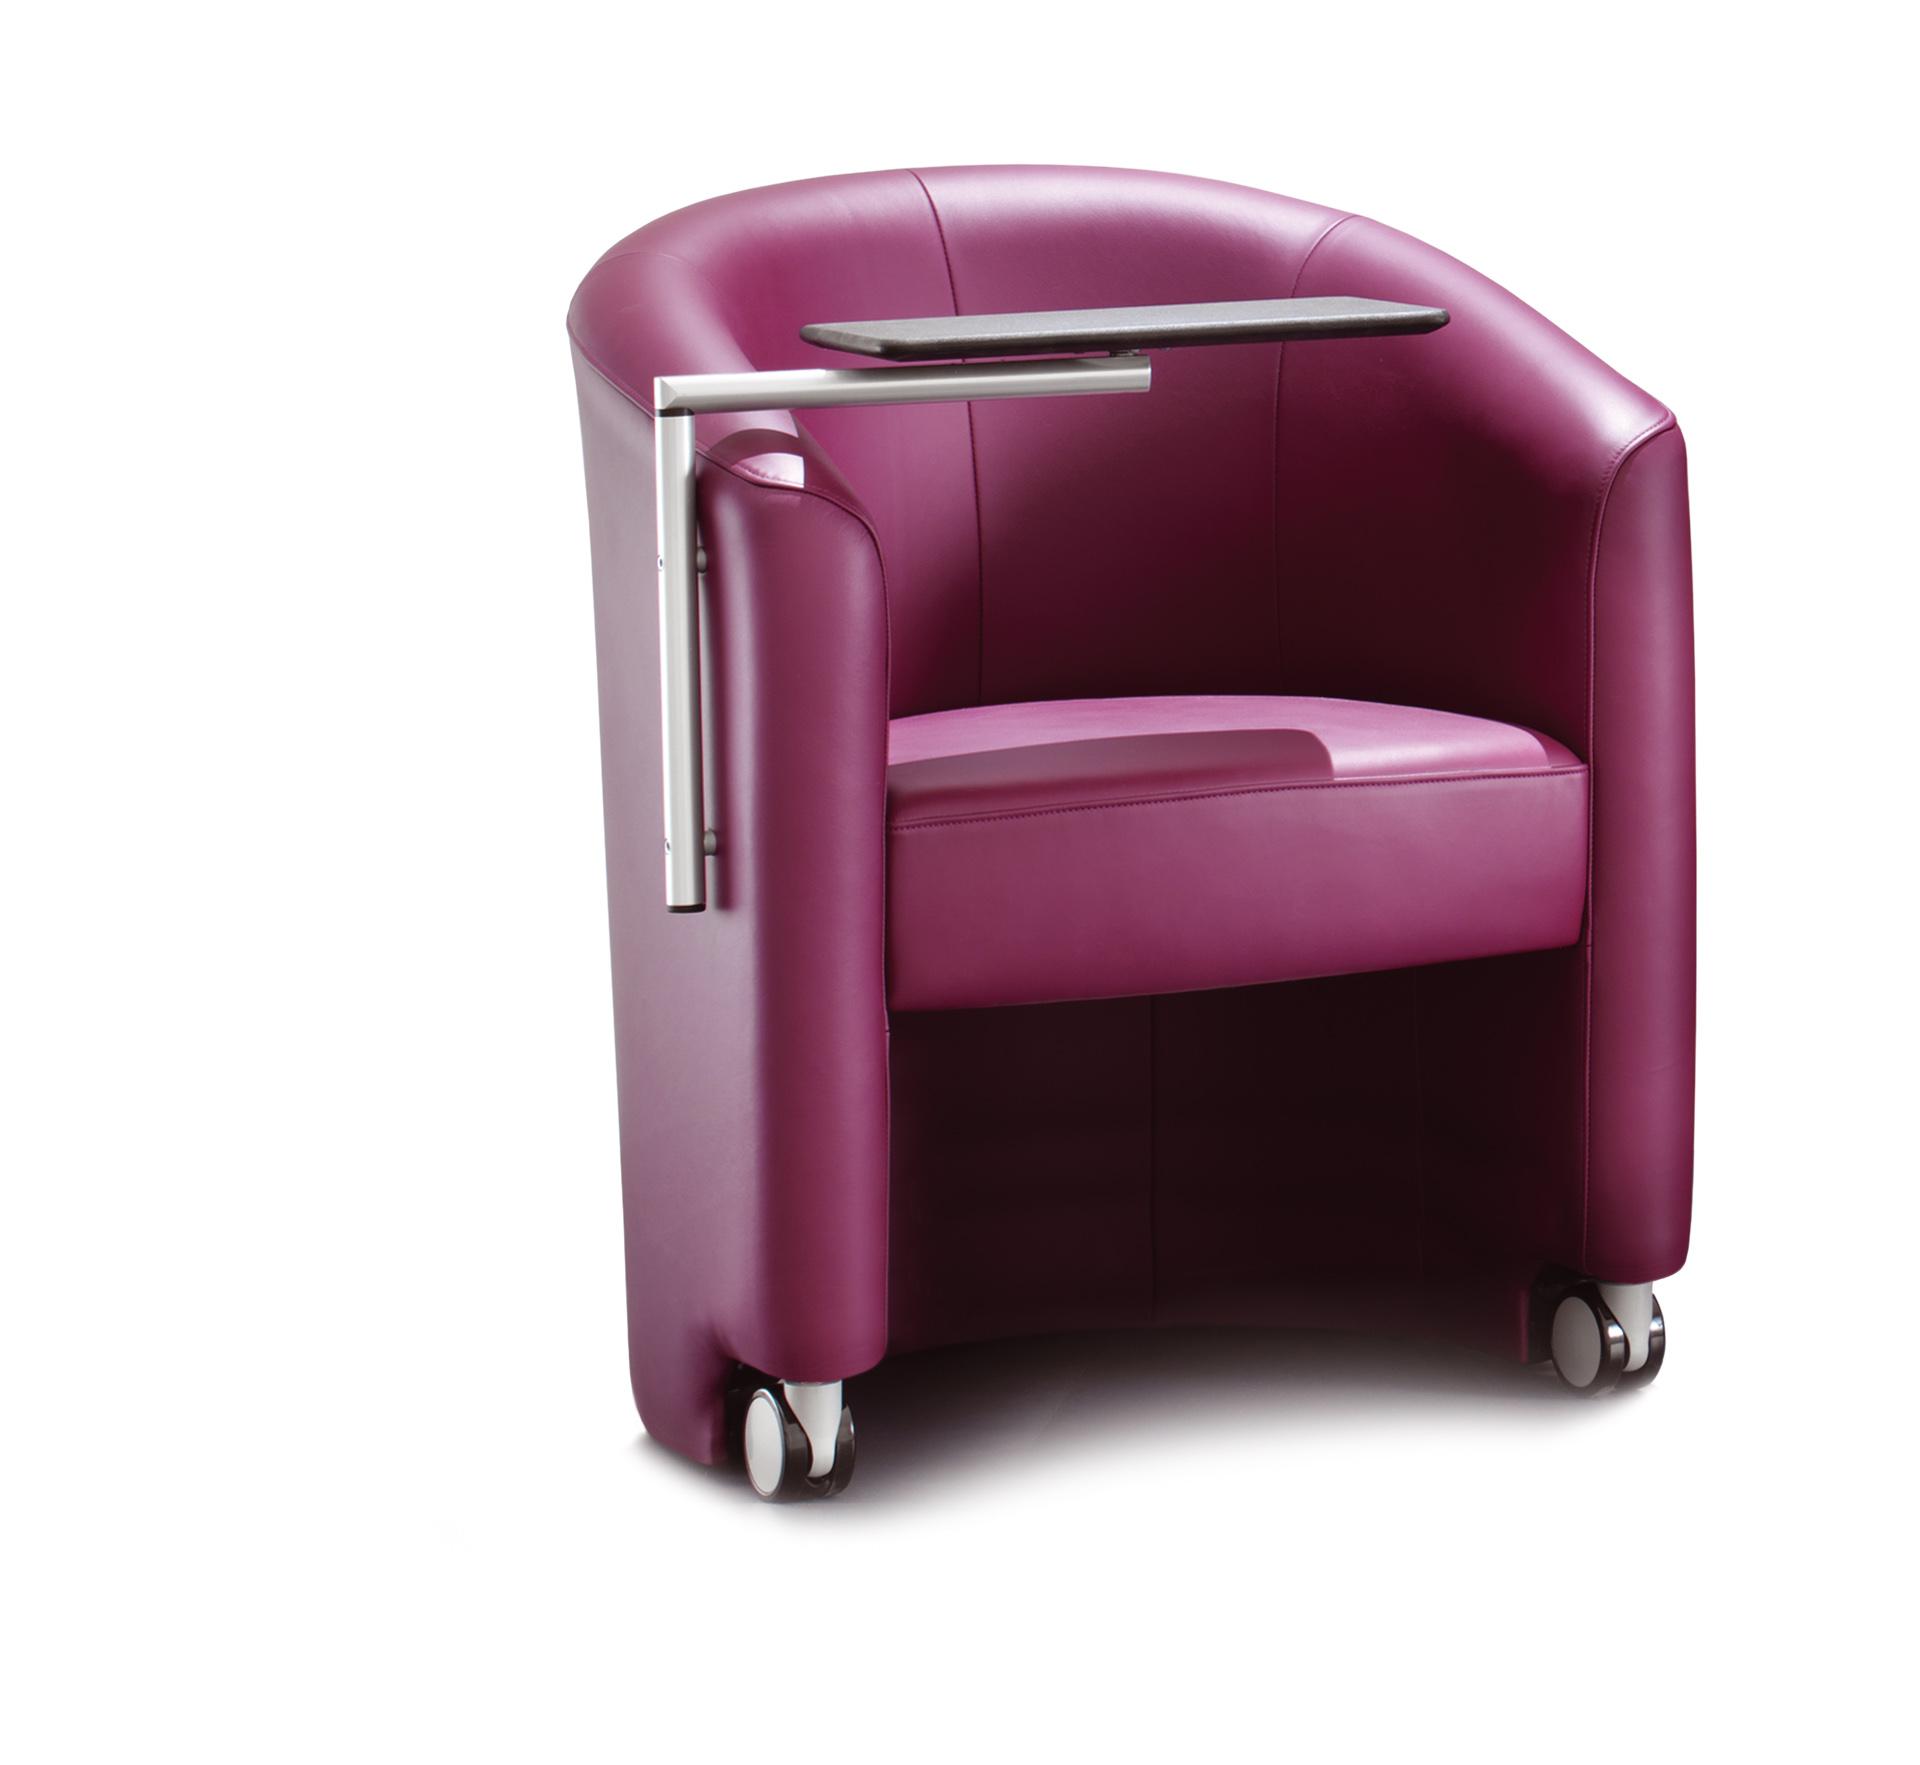 reception-seating-IMAGE 19